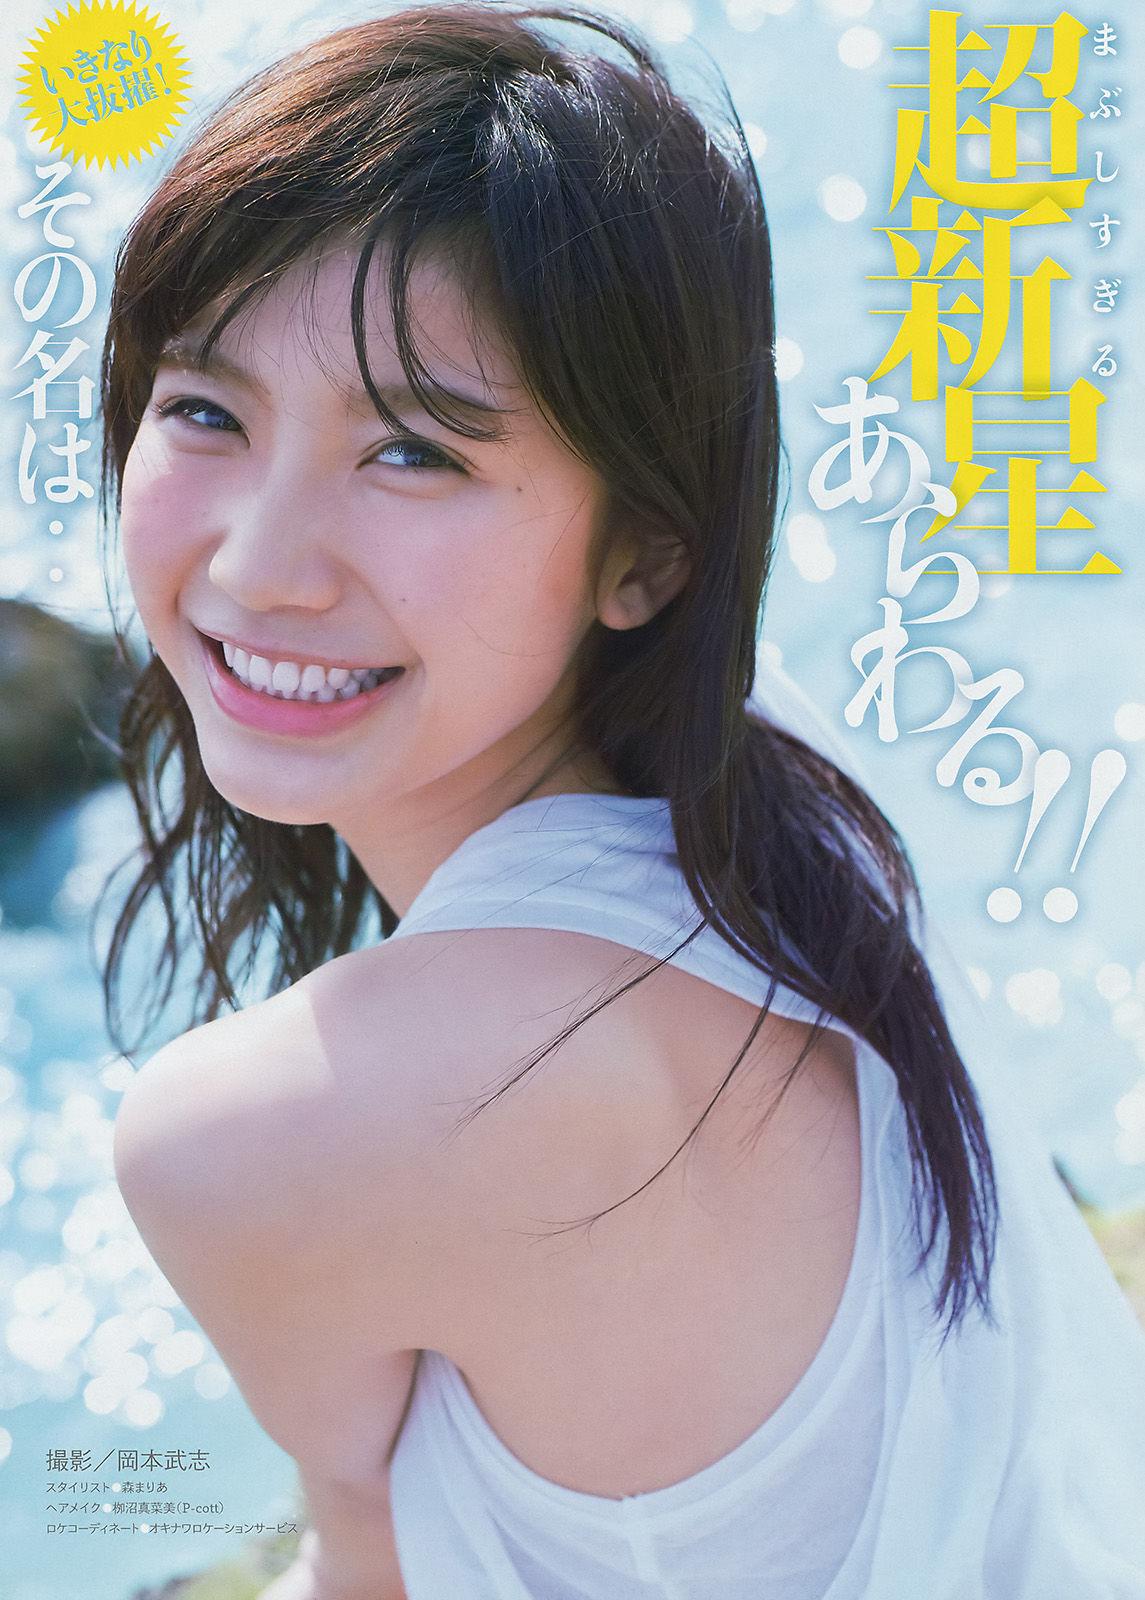 VOL.140 [Young Magazine]美胸:小仓优香超高清写真套图(11P)